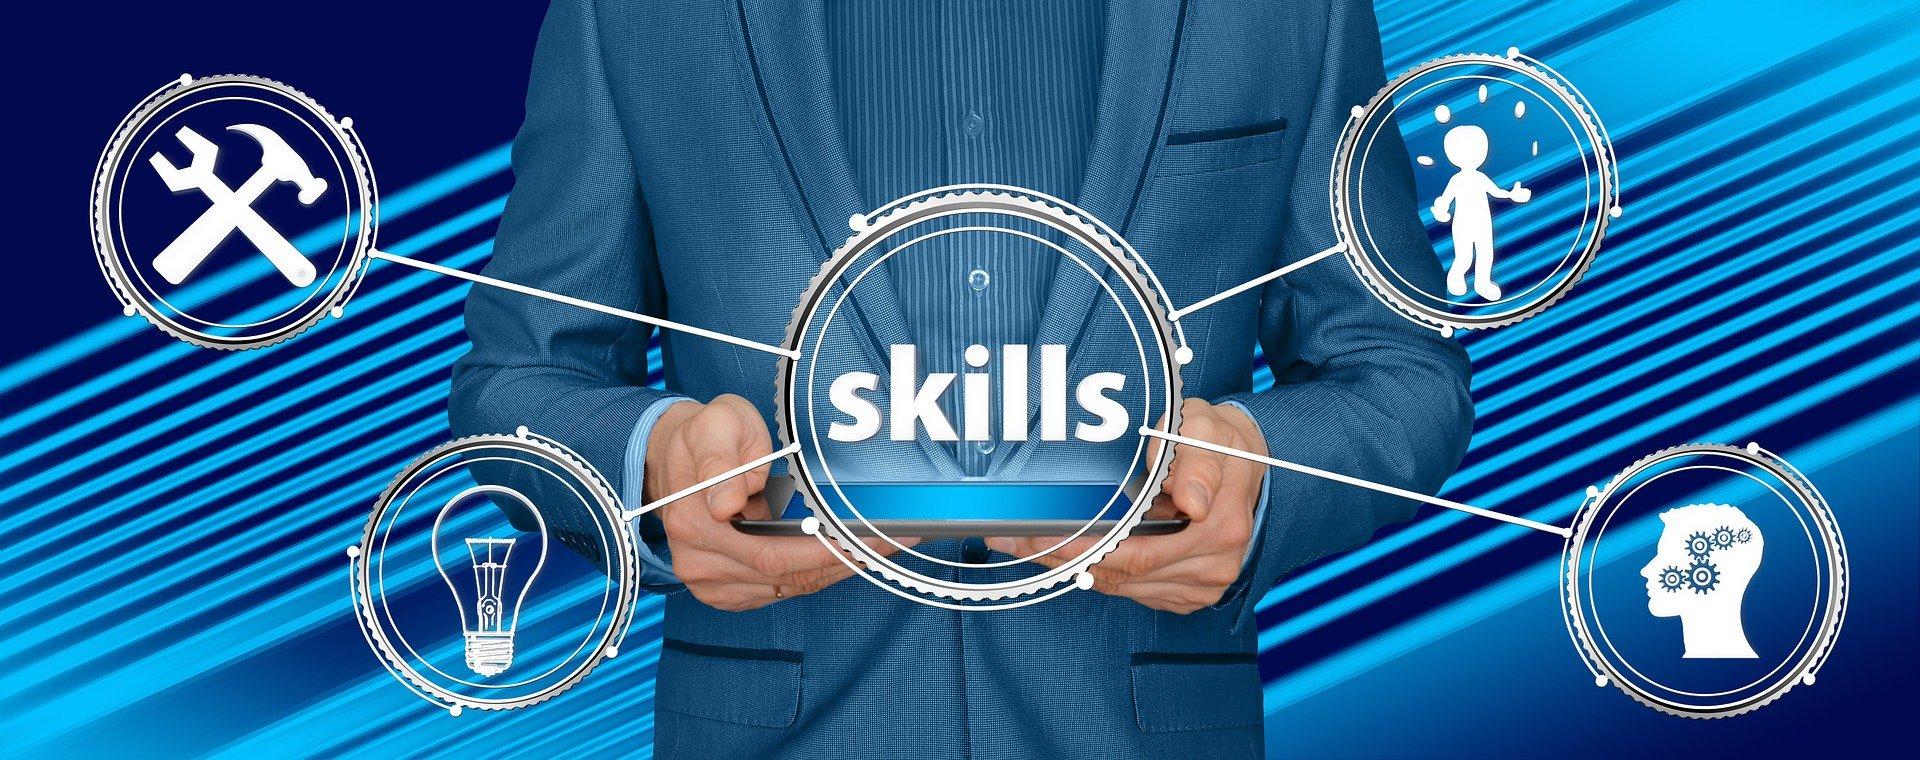 training-2874597_1920 Business Consultation